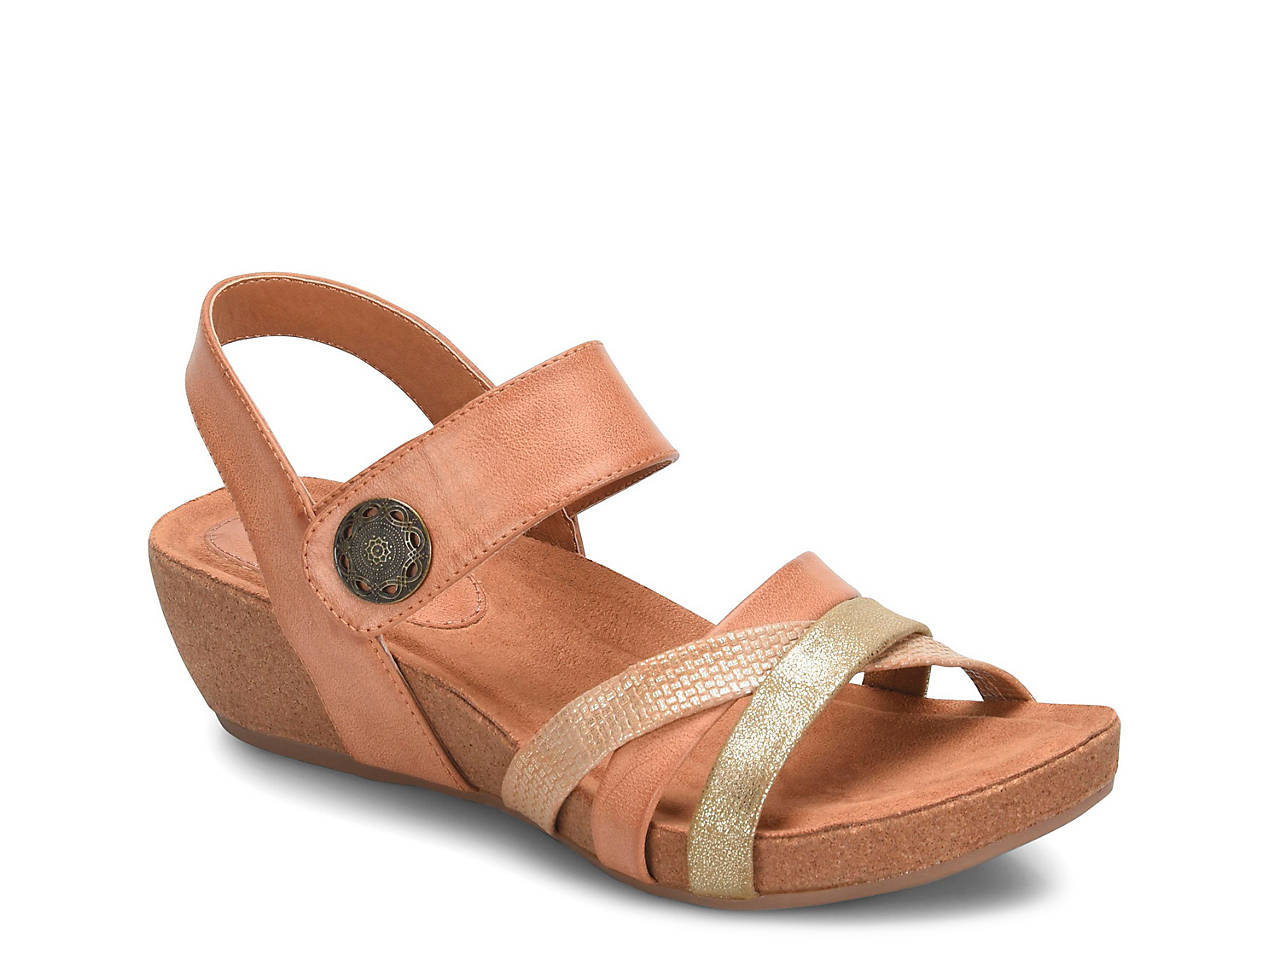 7eb99bf224fa Eurosoft Renae Wedge Sandal Women s Shoes